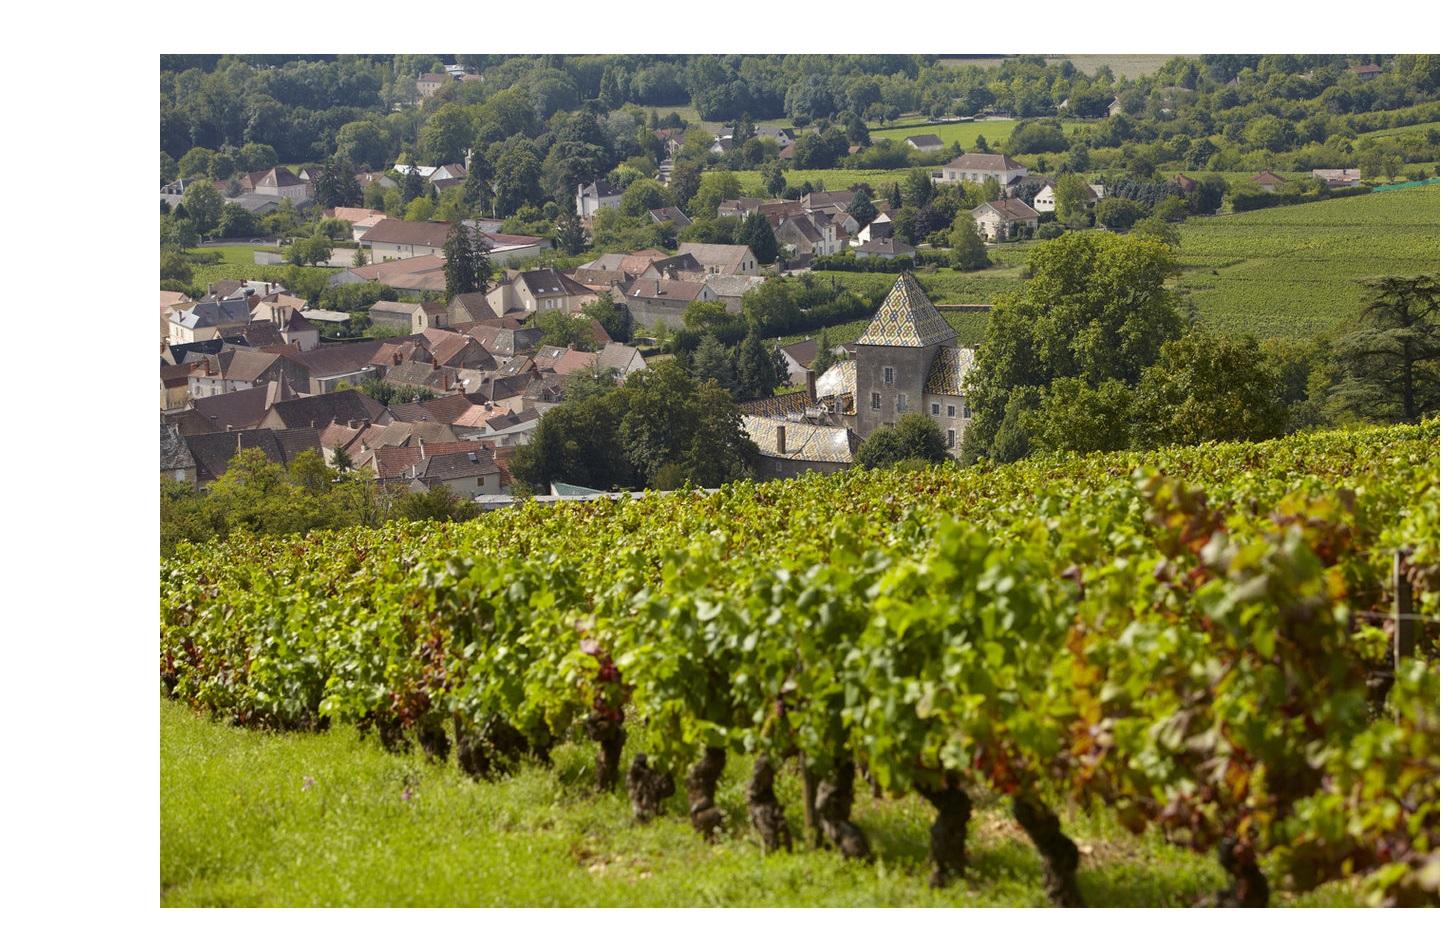 Santenay vignoble vins premiers crus